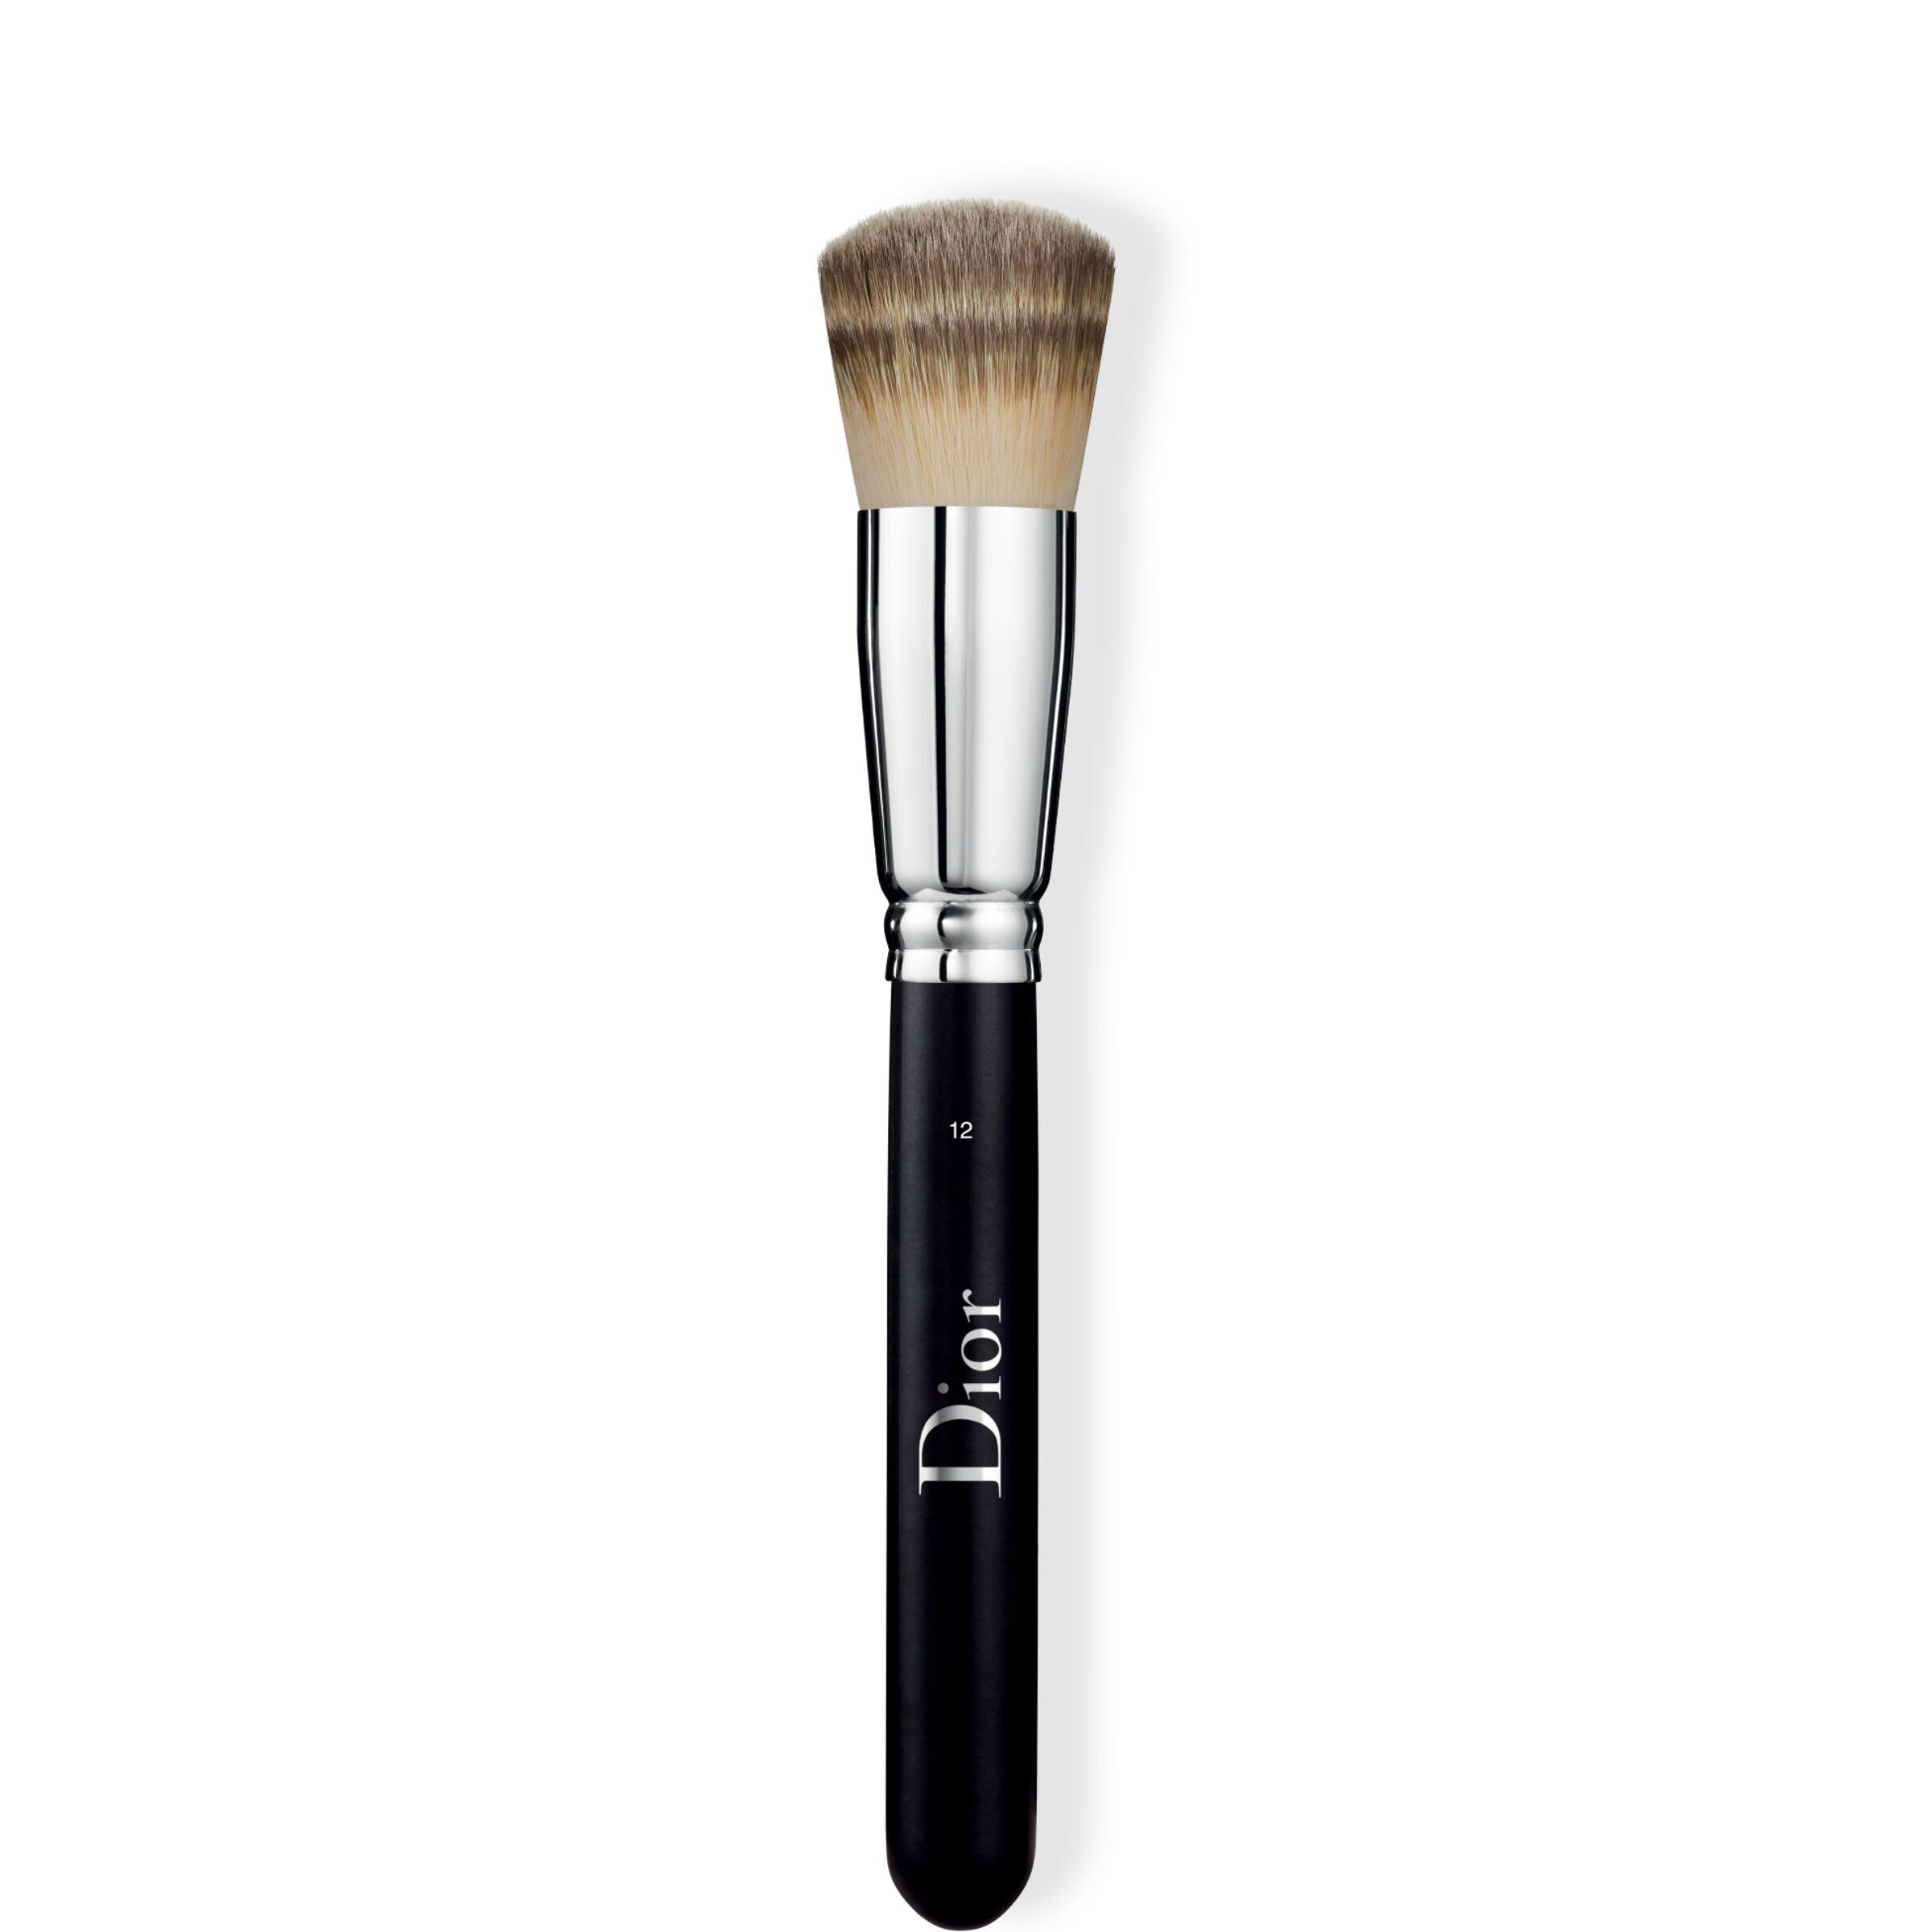 Dior Backstage Full Coverage Fluid Foundation Brush N°12